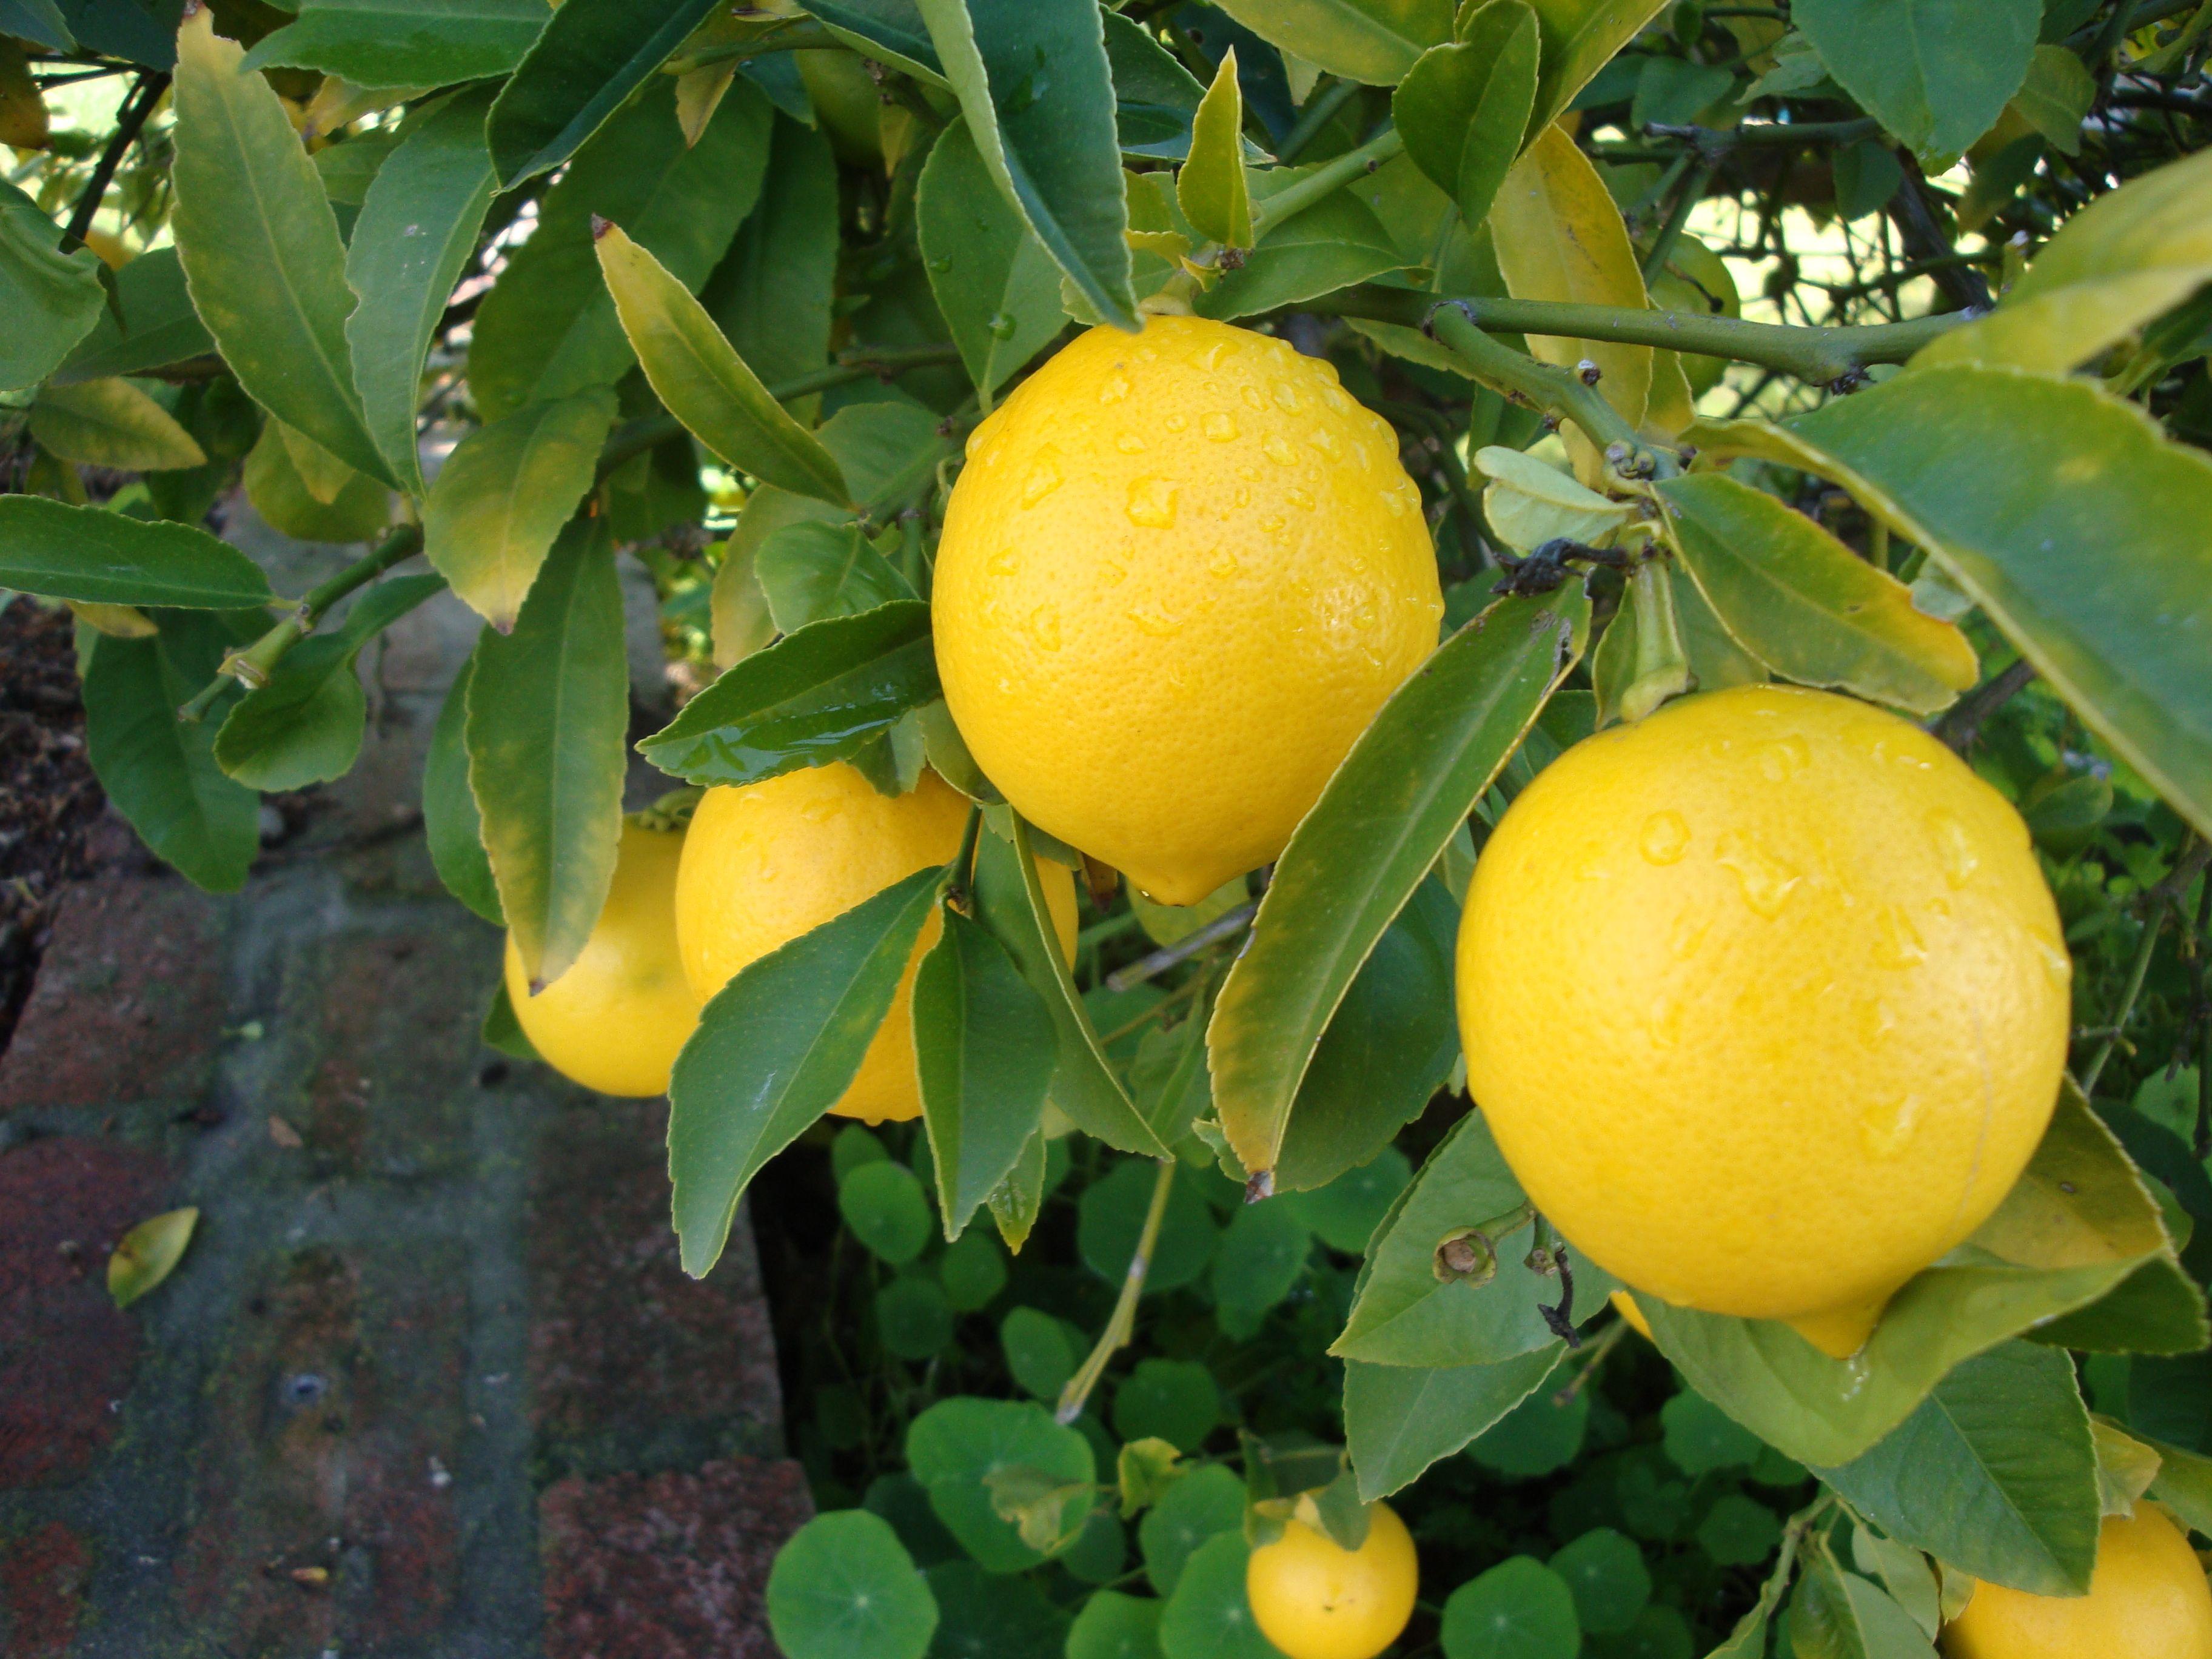 rare 5 lemon tree citrus seeds grow your own miniature tree next day shipping ebay. Black Bedroom Furniture Sets. Home Design Ideas